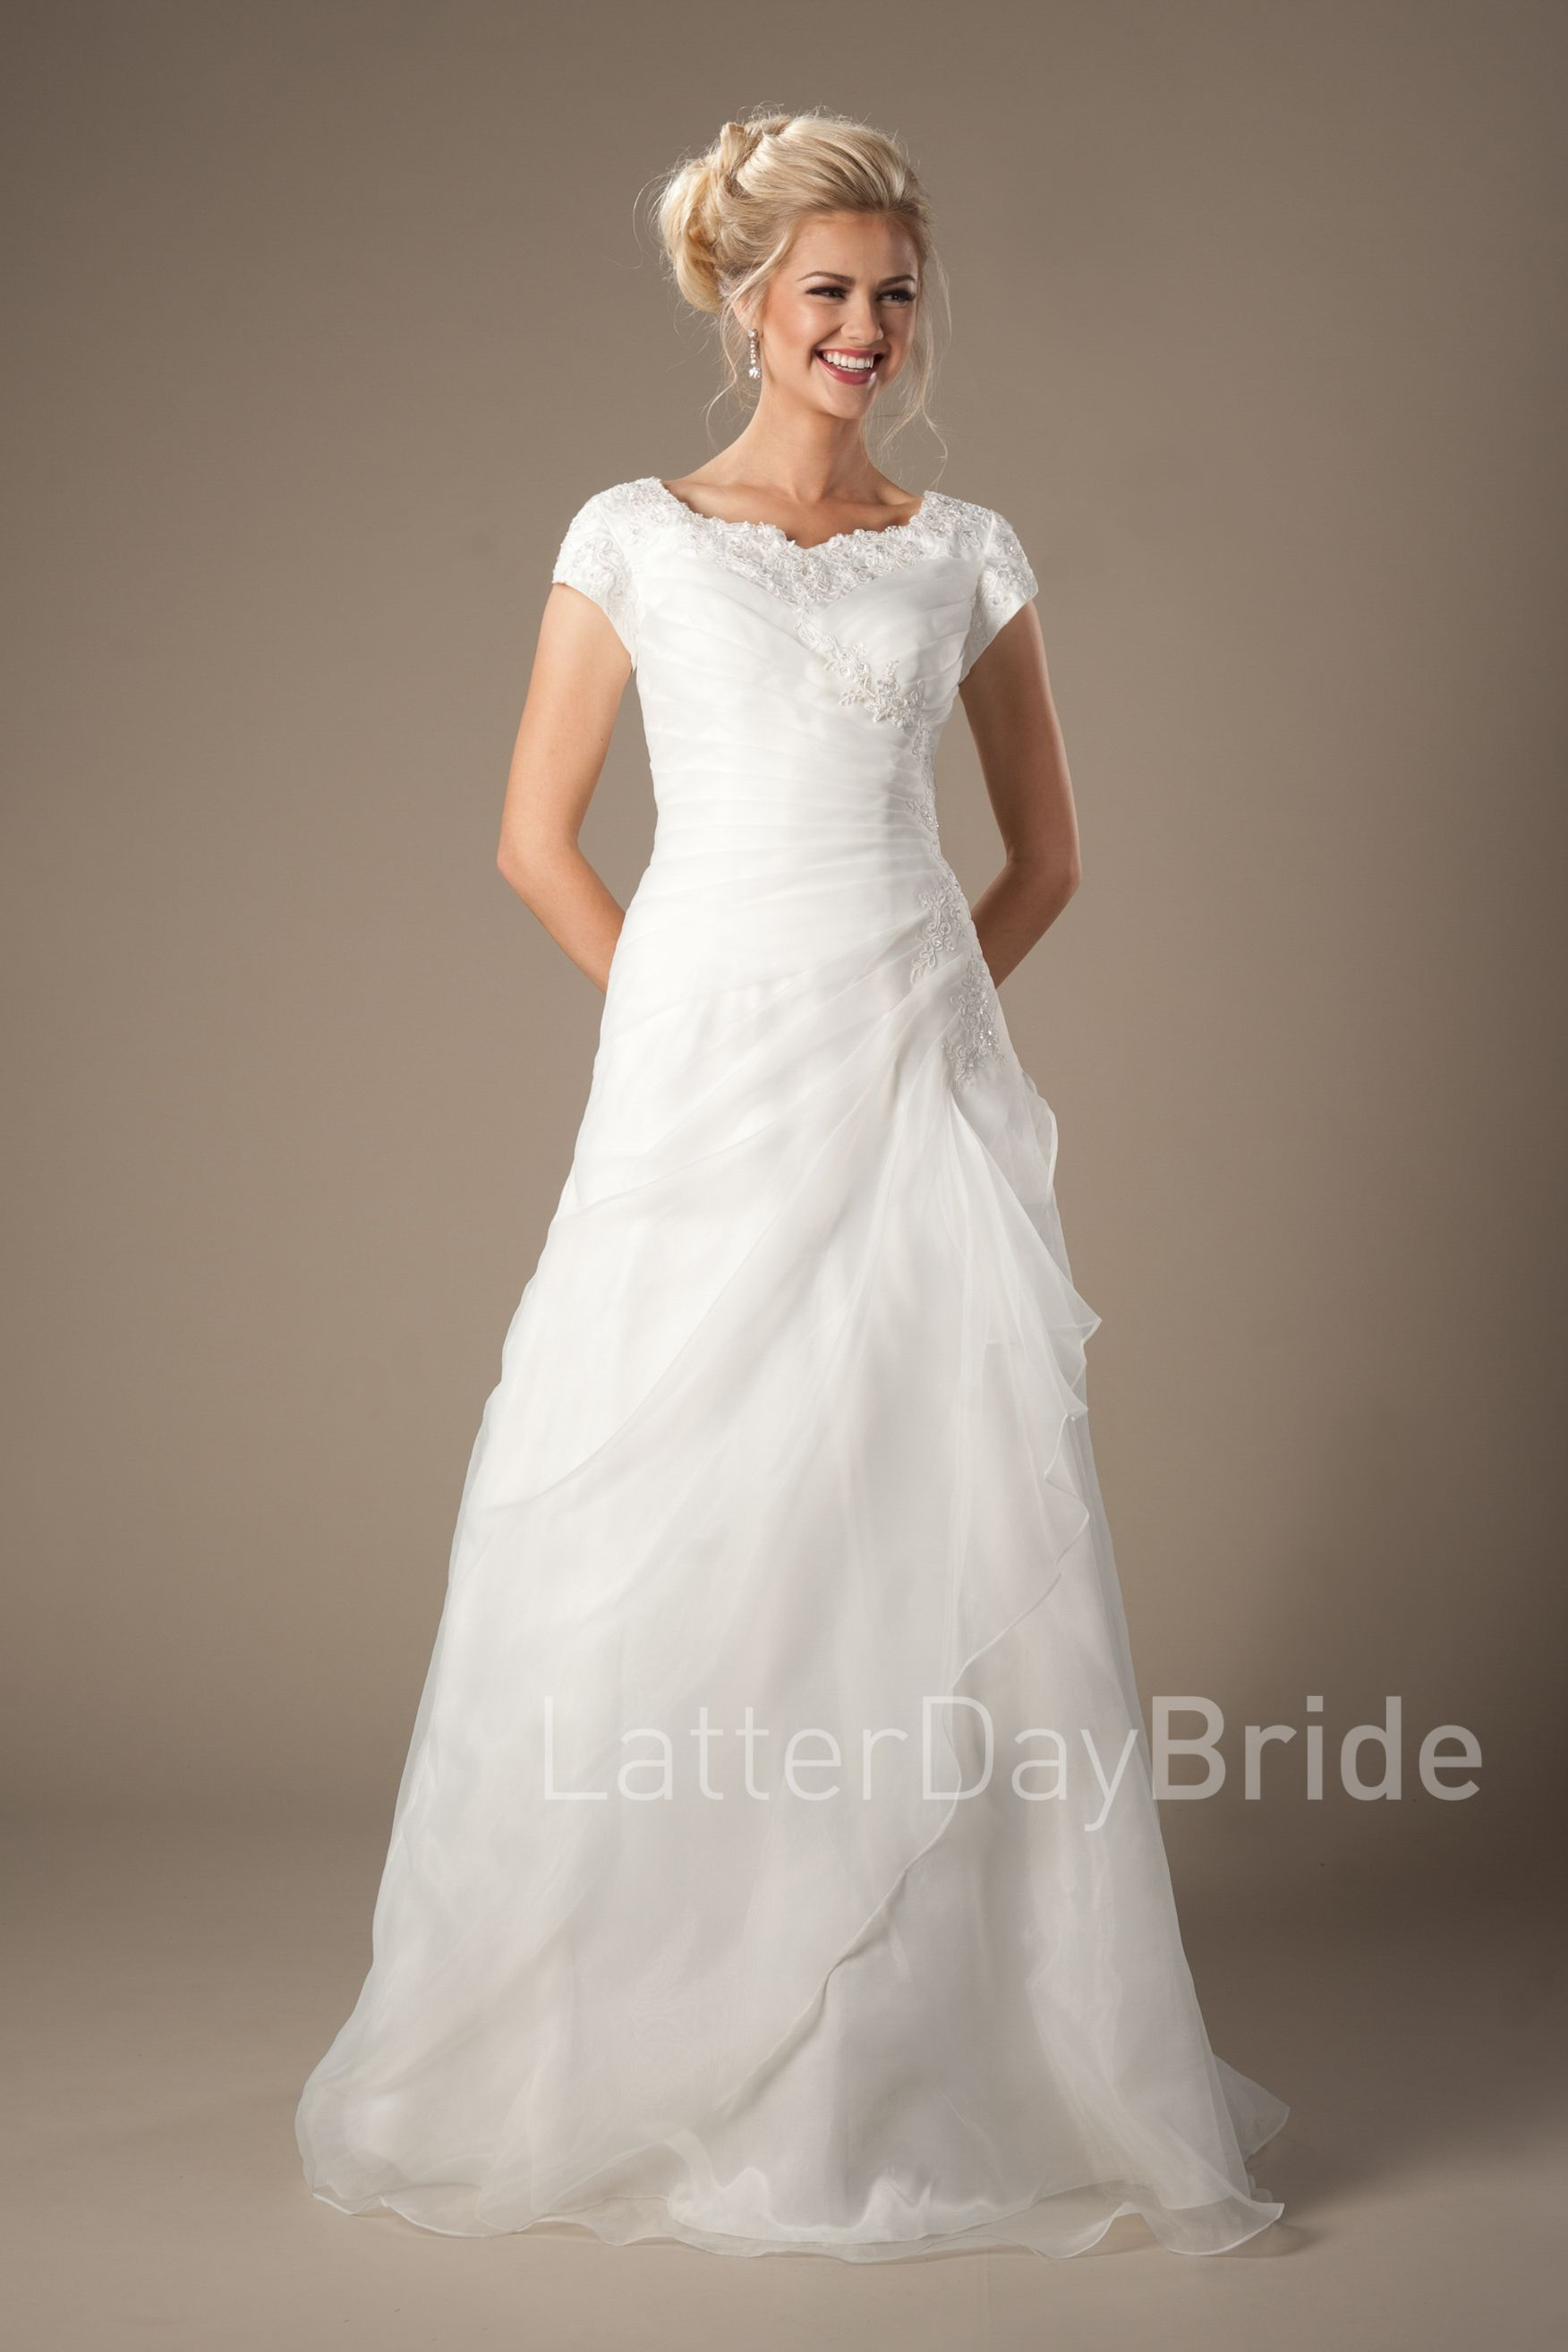 Drummond | Modest Wedding Dress | LatterDayBride & Prom | SLC ...